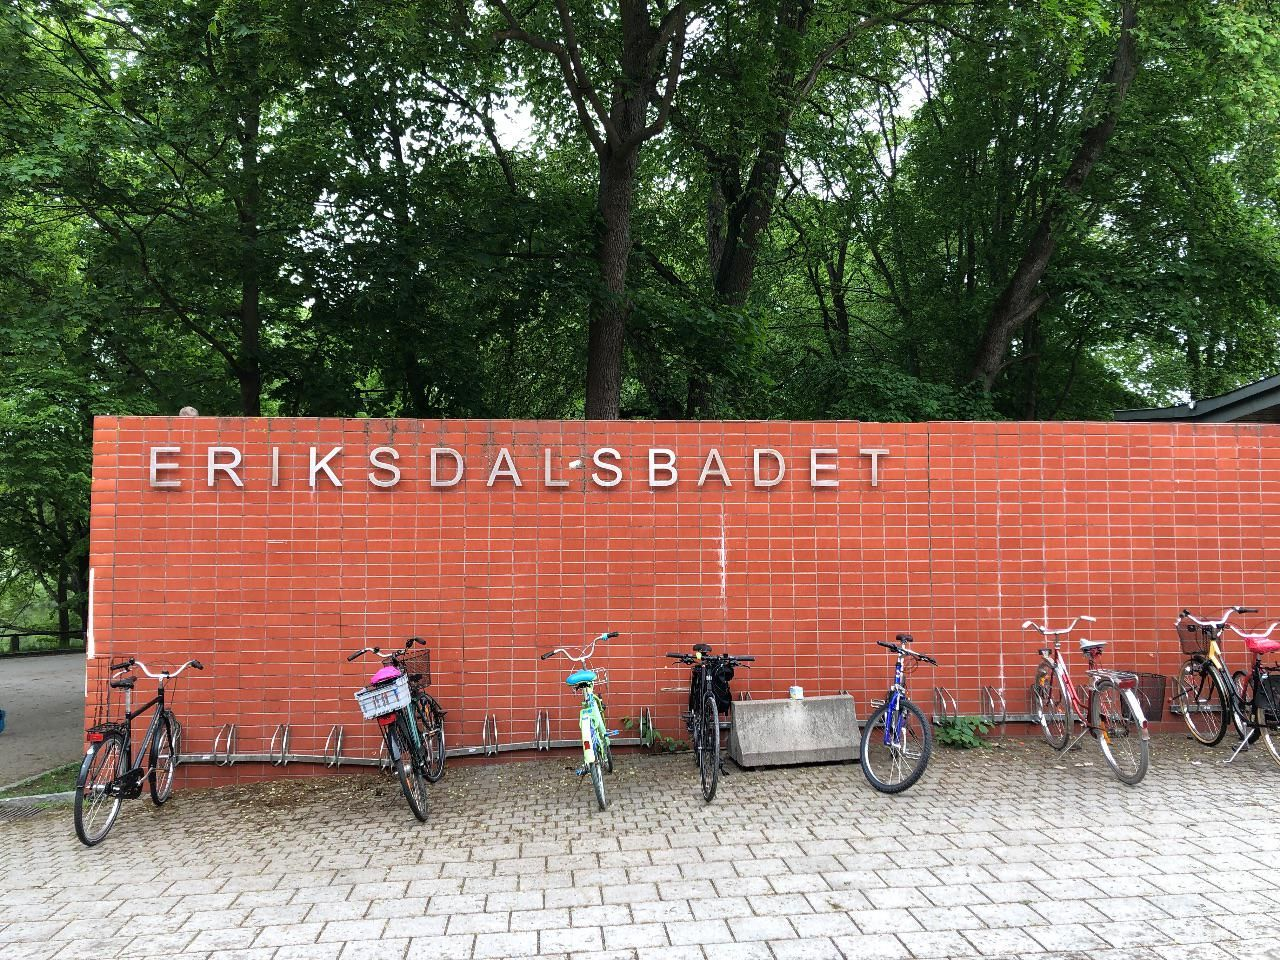 Eriksdalsbadet, Södermalm, Stockholm.